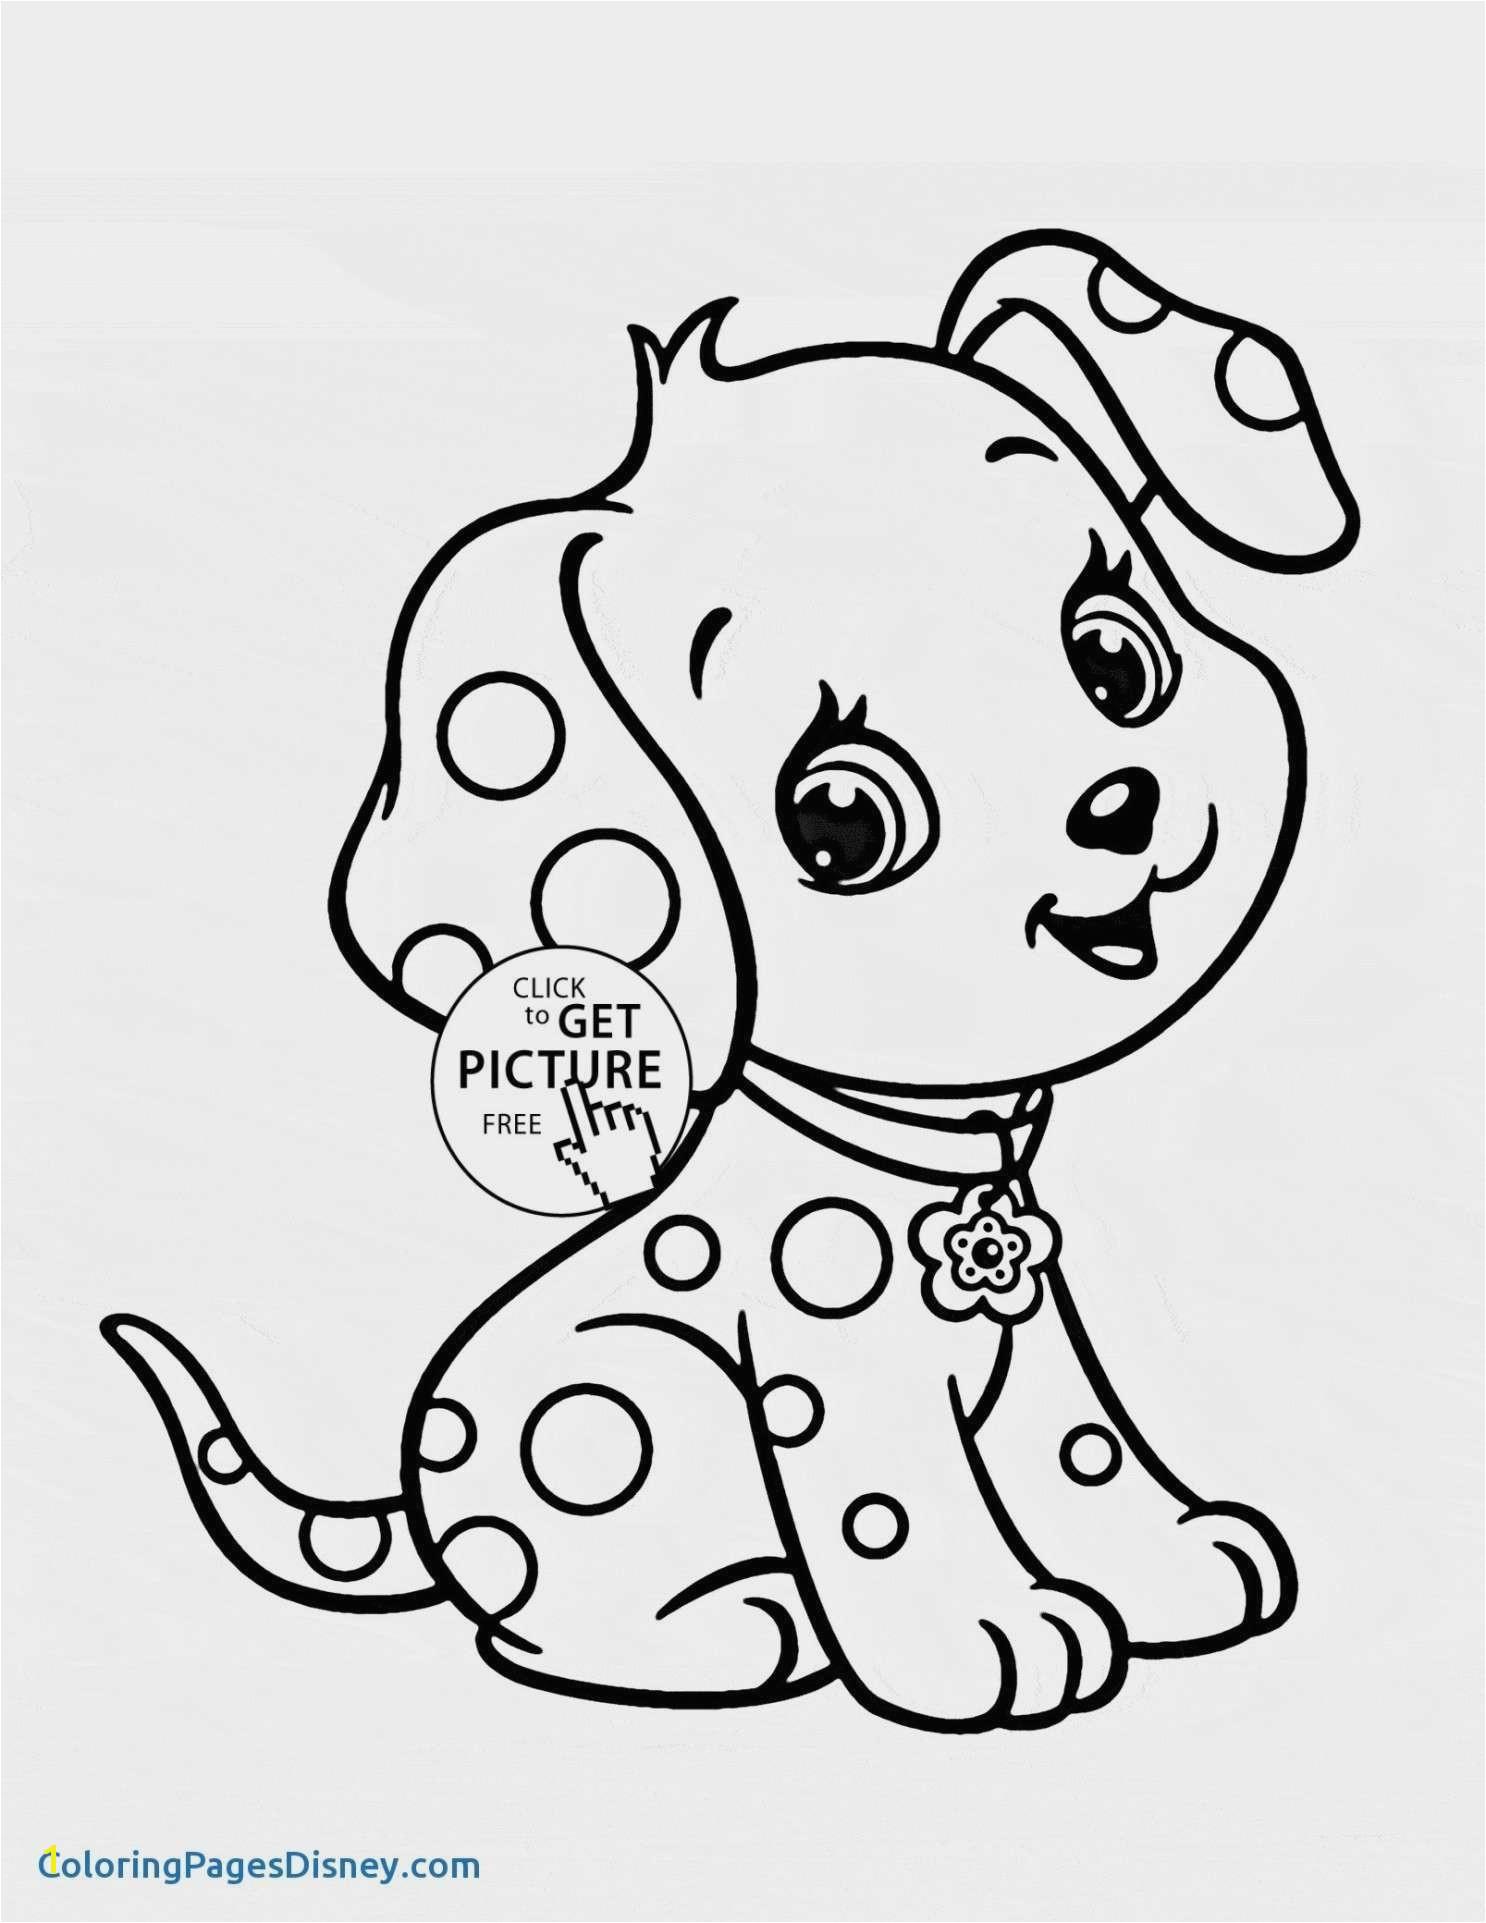 Cupcake Coloring Pages Free Printable 27 Princess Drawing Sheets Download